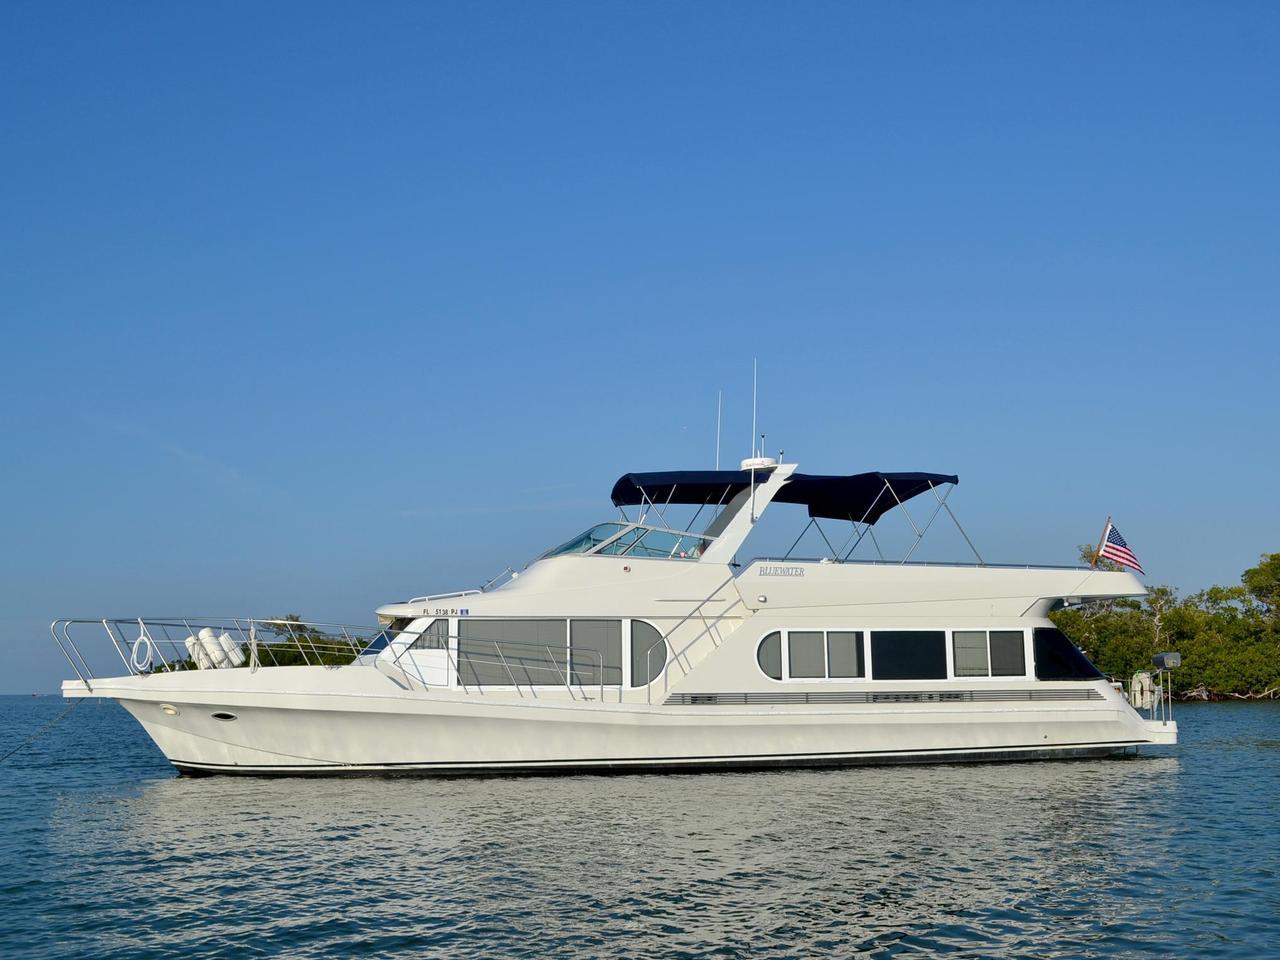 1995 used bluewater coastal cruisercoastal cruiser house boat for sale 159 000 cape coral. Black Bedroom Furniture Sets. Home Design Ideas